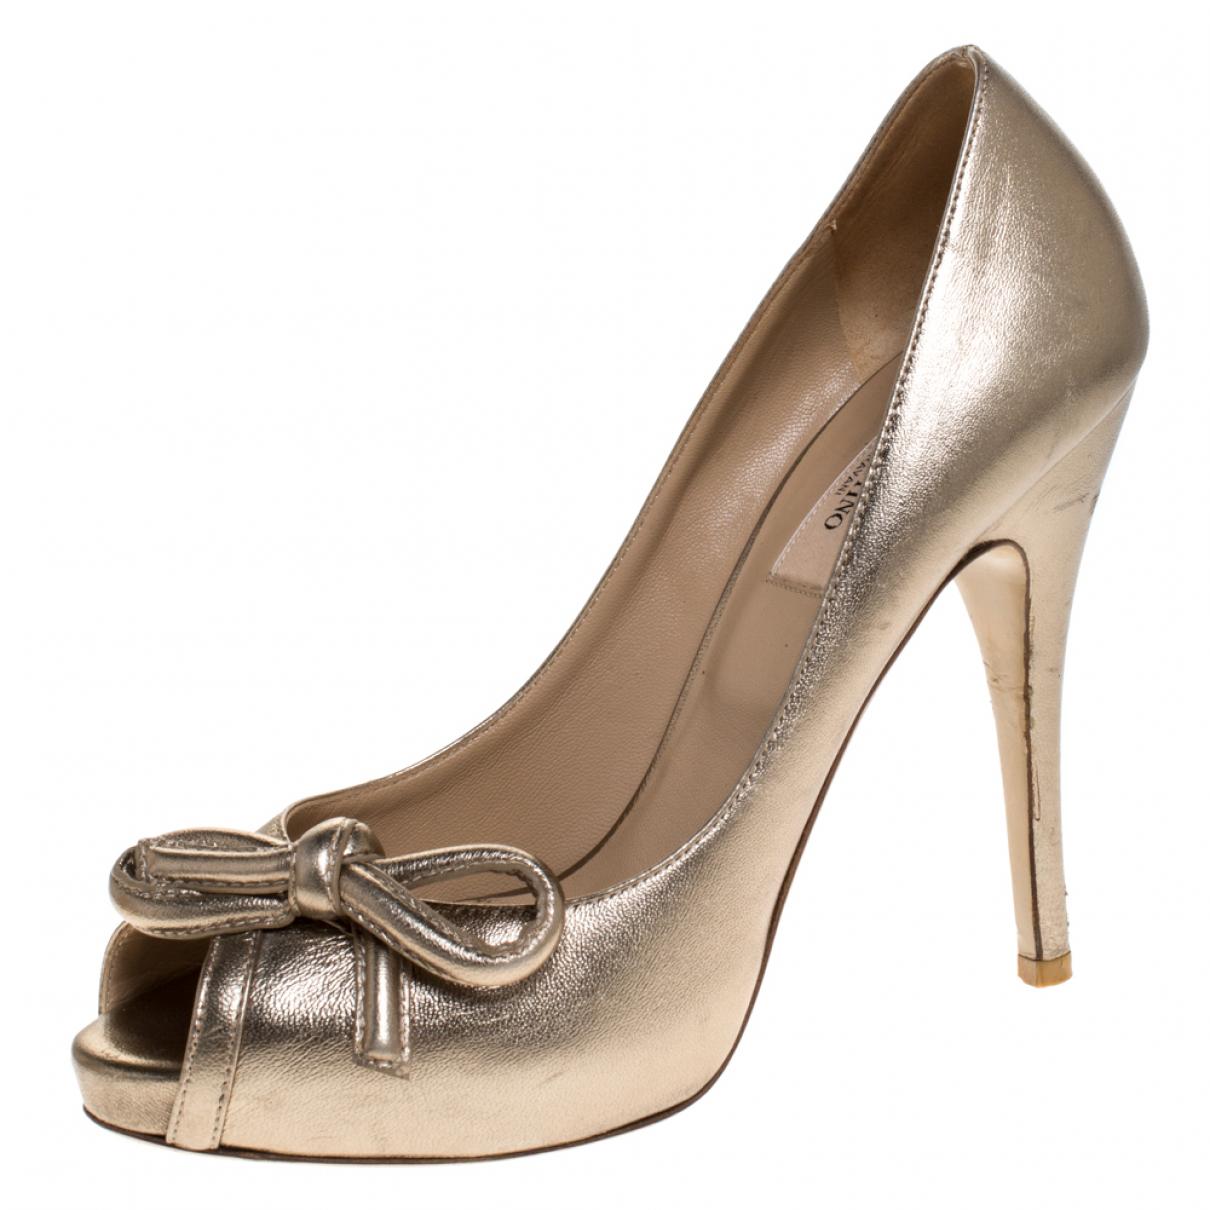 Autre Marque N Metallic Leather Sandals for Women 8 US